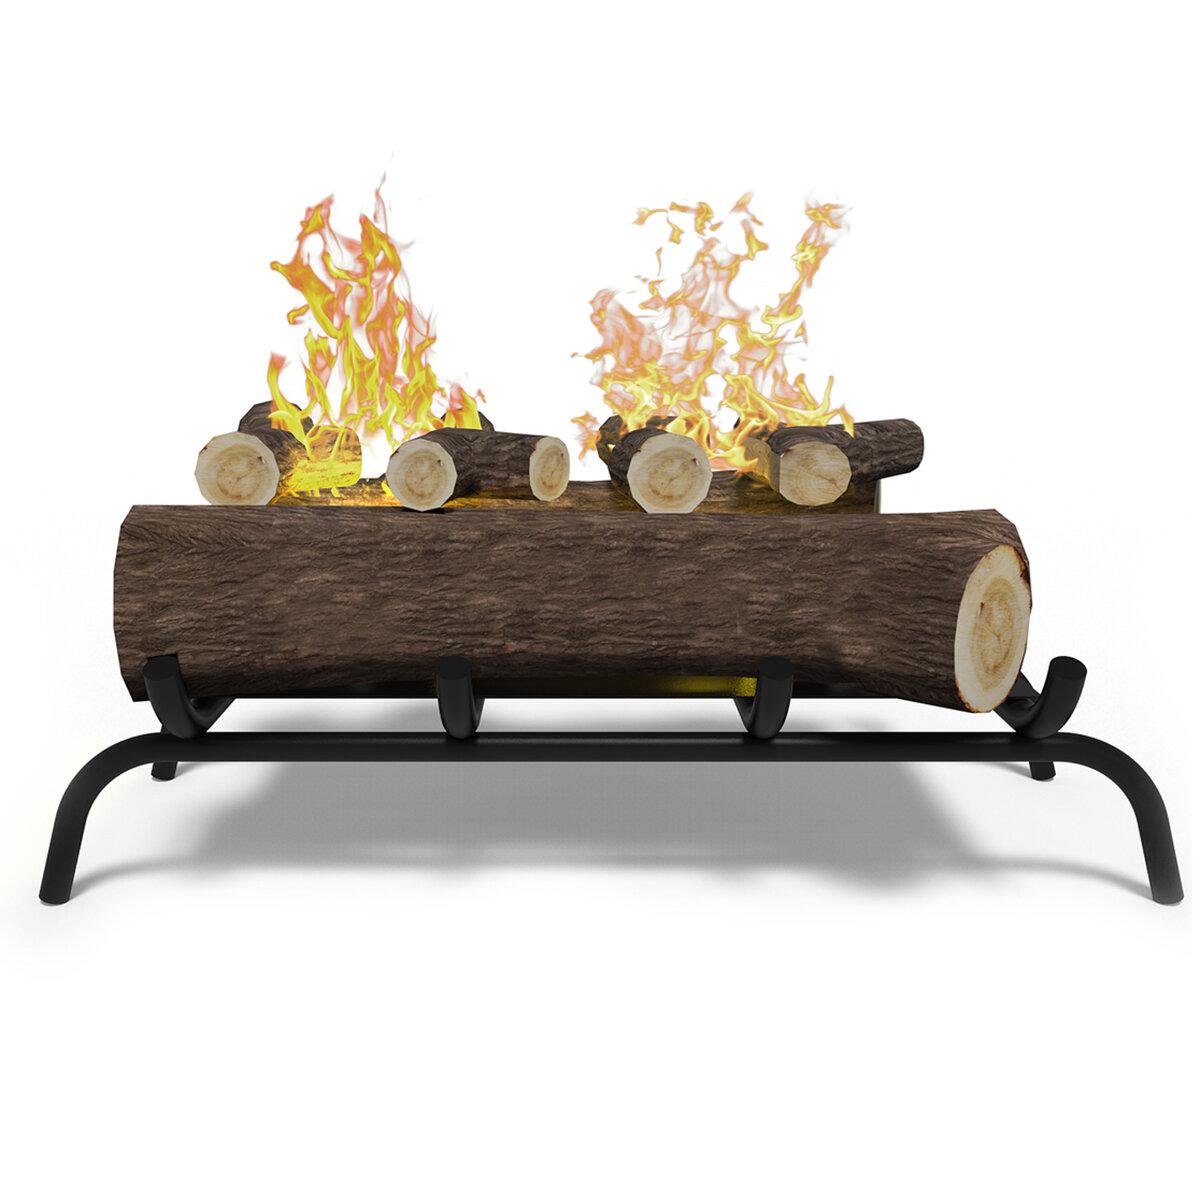 regalflame convert to ethanol fireplace log set with burner insert rh wayfair com